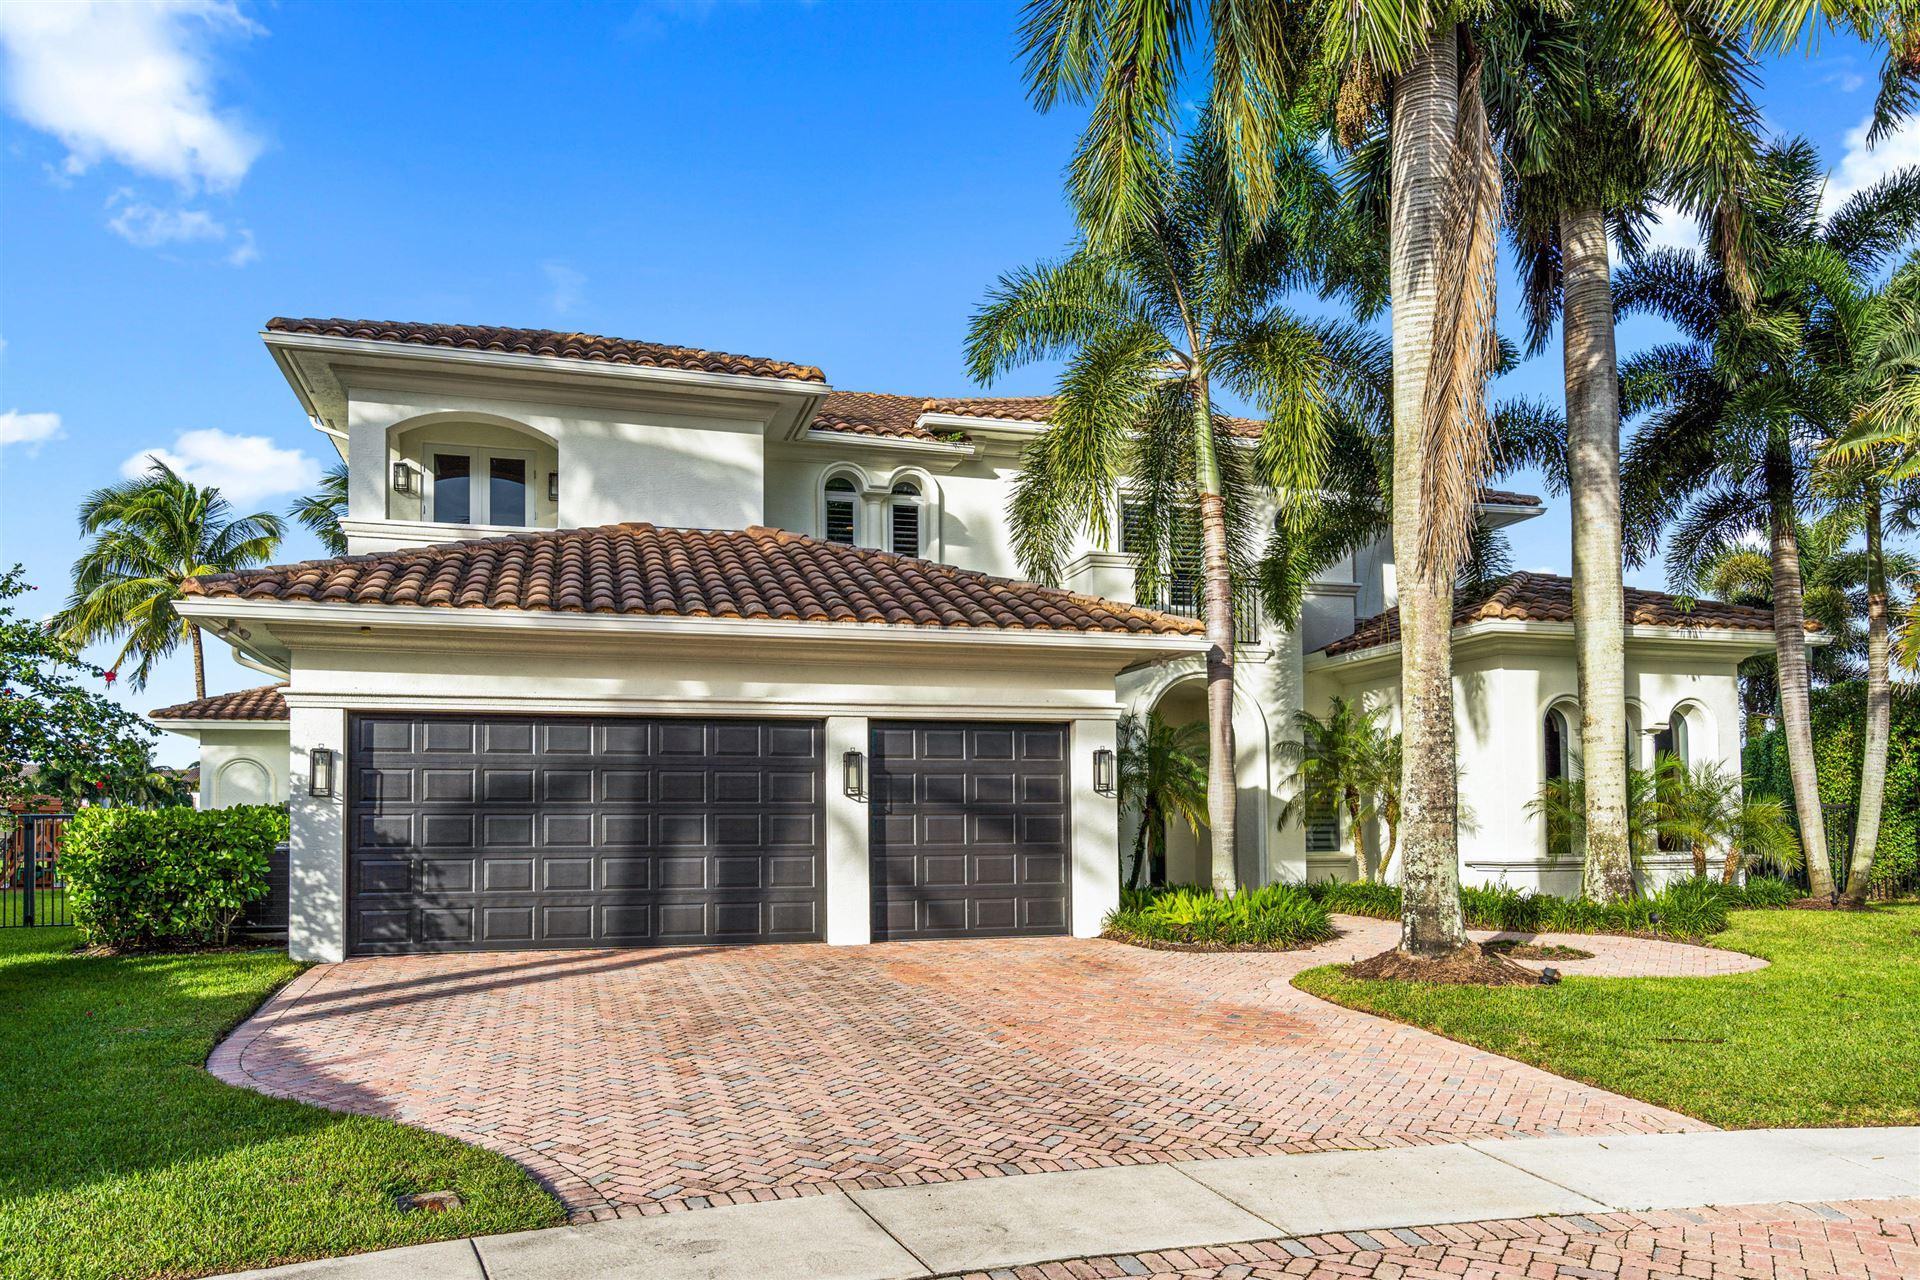 Photo of 17678 Lomond Court, Boca Raton, FL 33496 (MLS # RX-10658137)